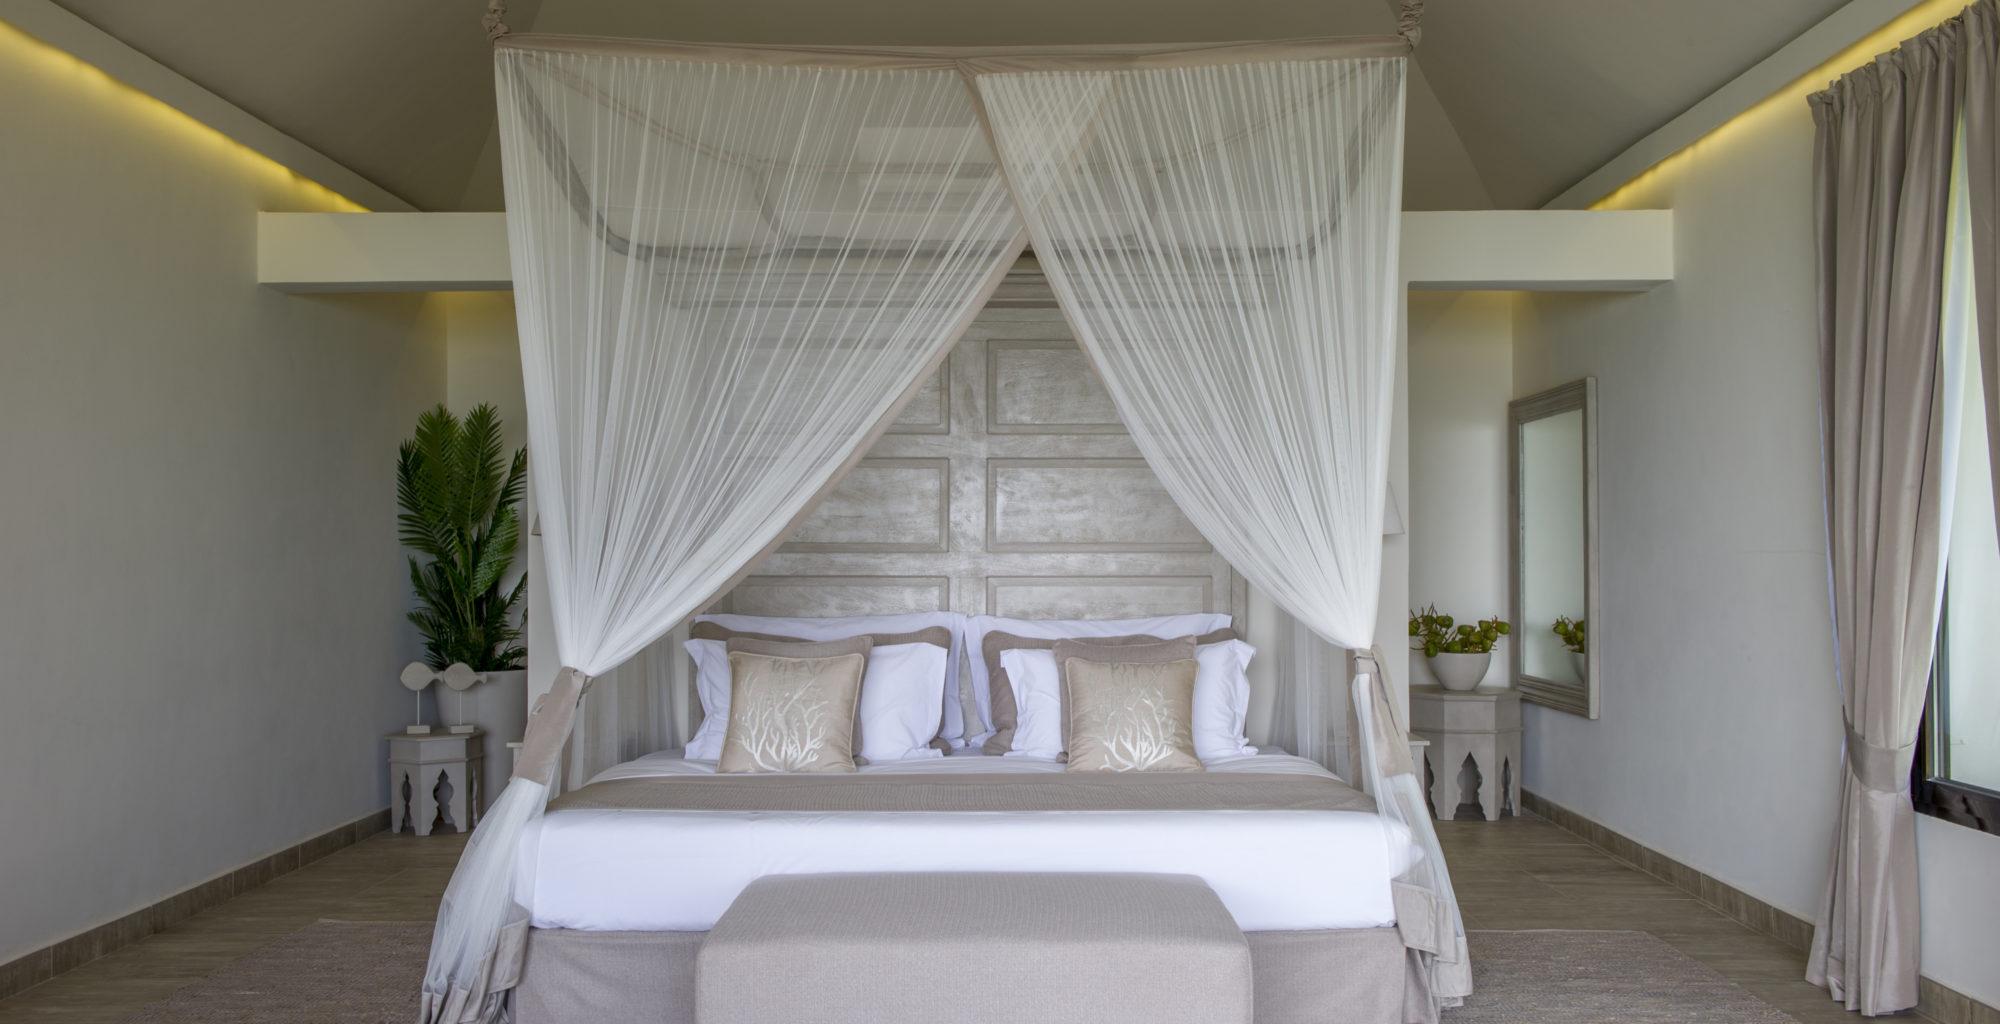 Tanzania-Zawadi-Bedroom